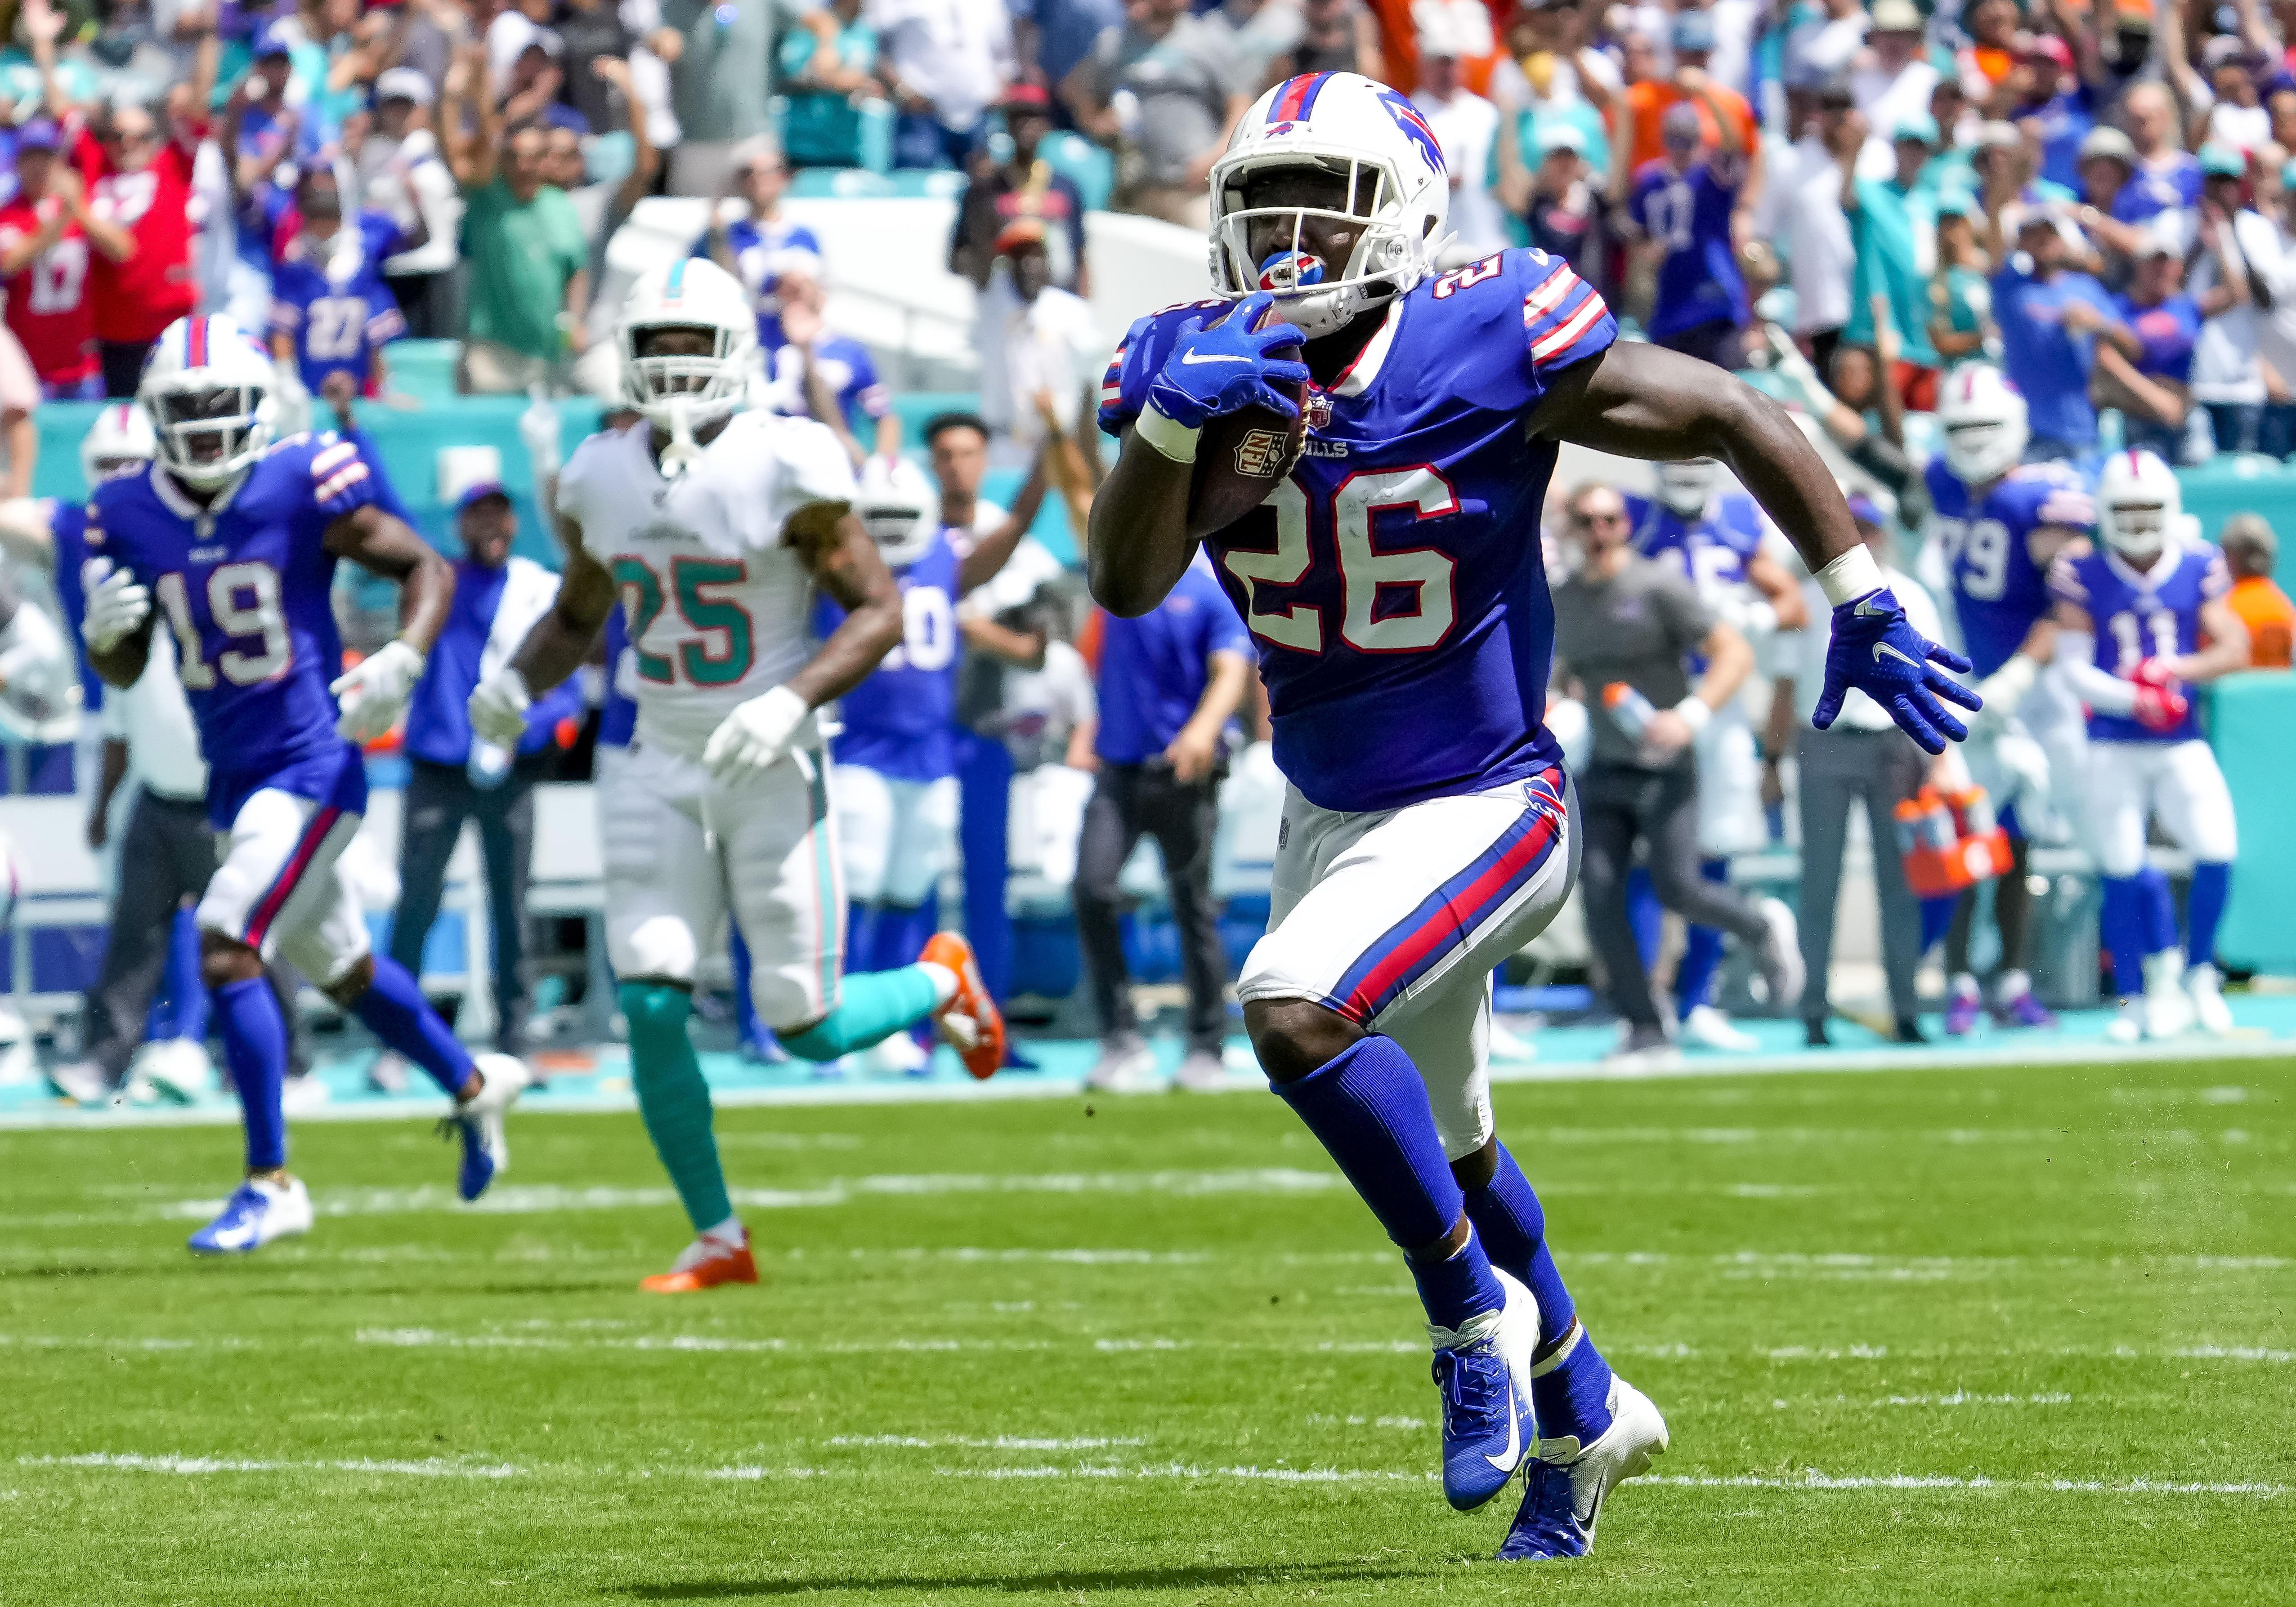 NFL: SEP 19 Bills at Dolphins